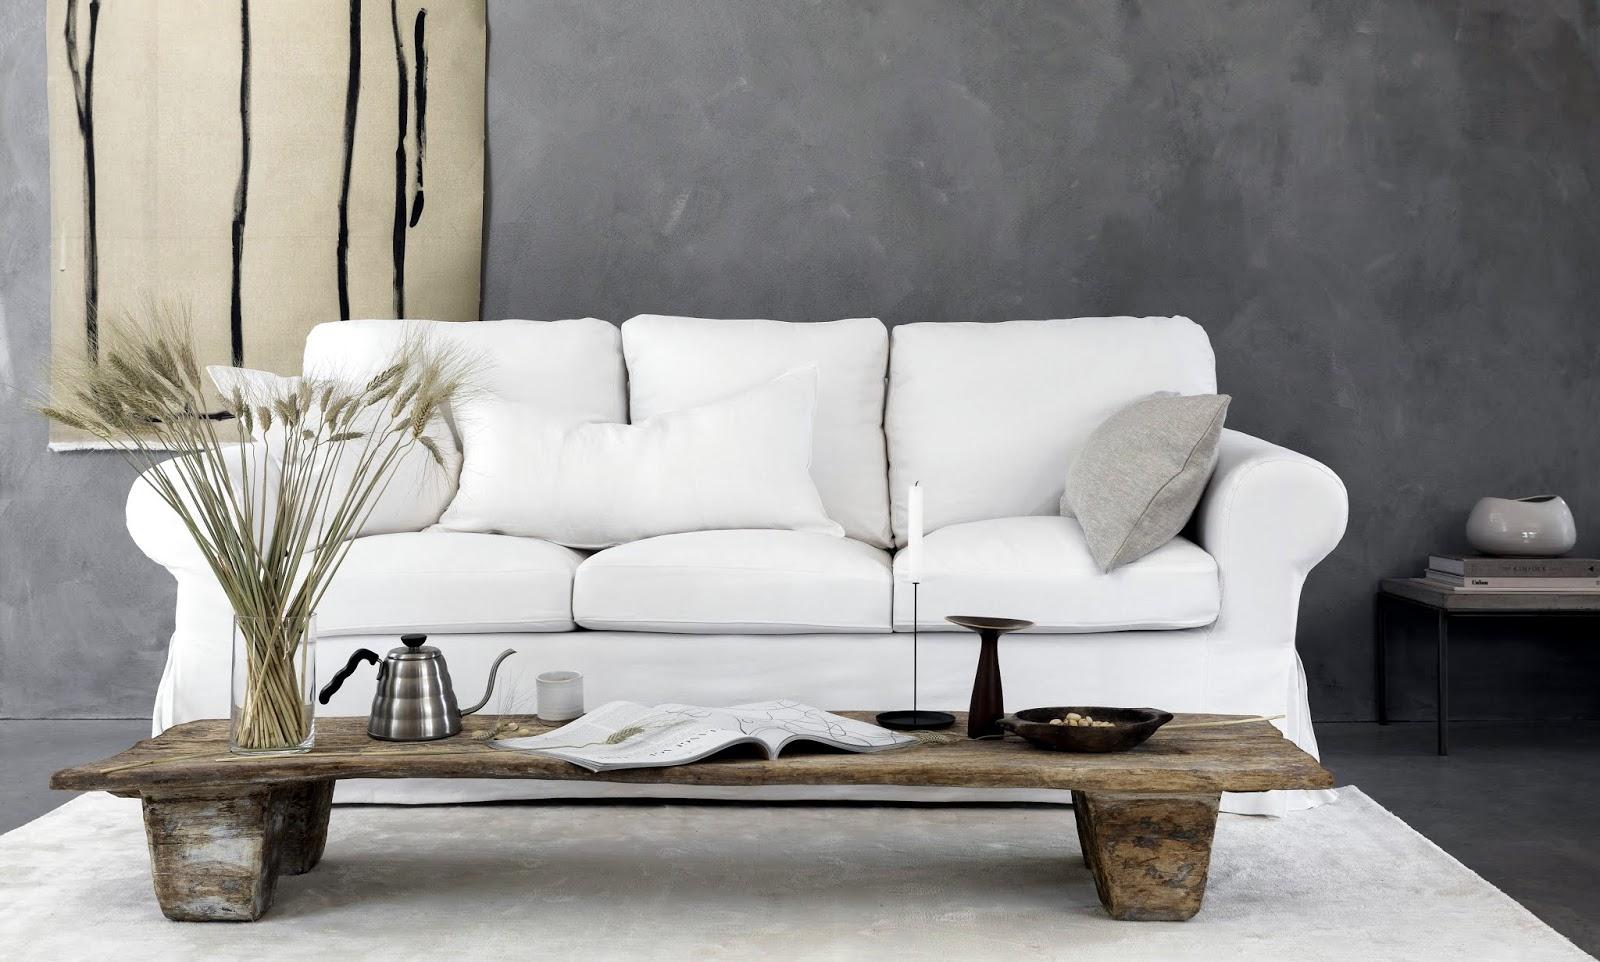 Ikea Sofa Einen Art Gib Dem Mit CoverHomeamp; Look Bemz Neuen 5LRqA4jc3